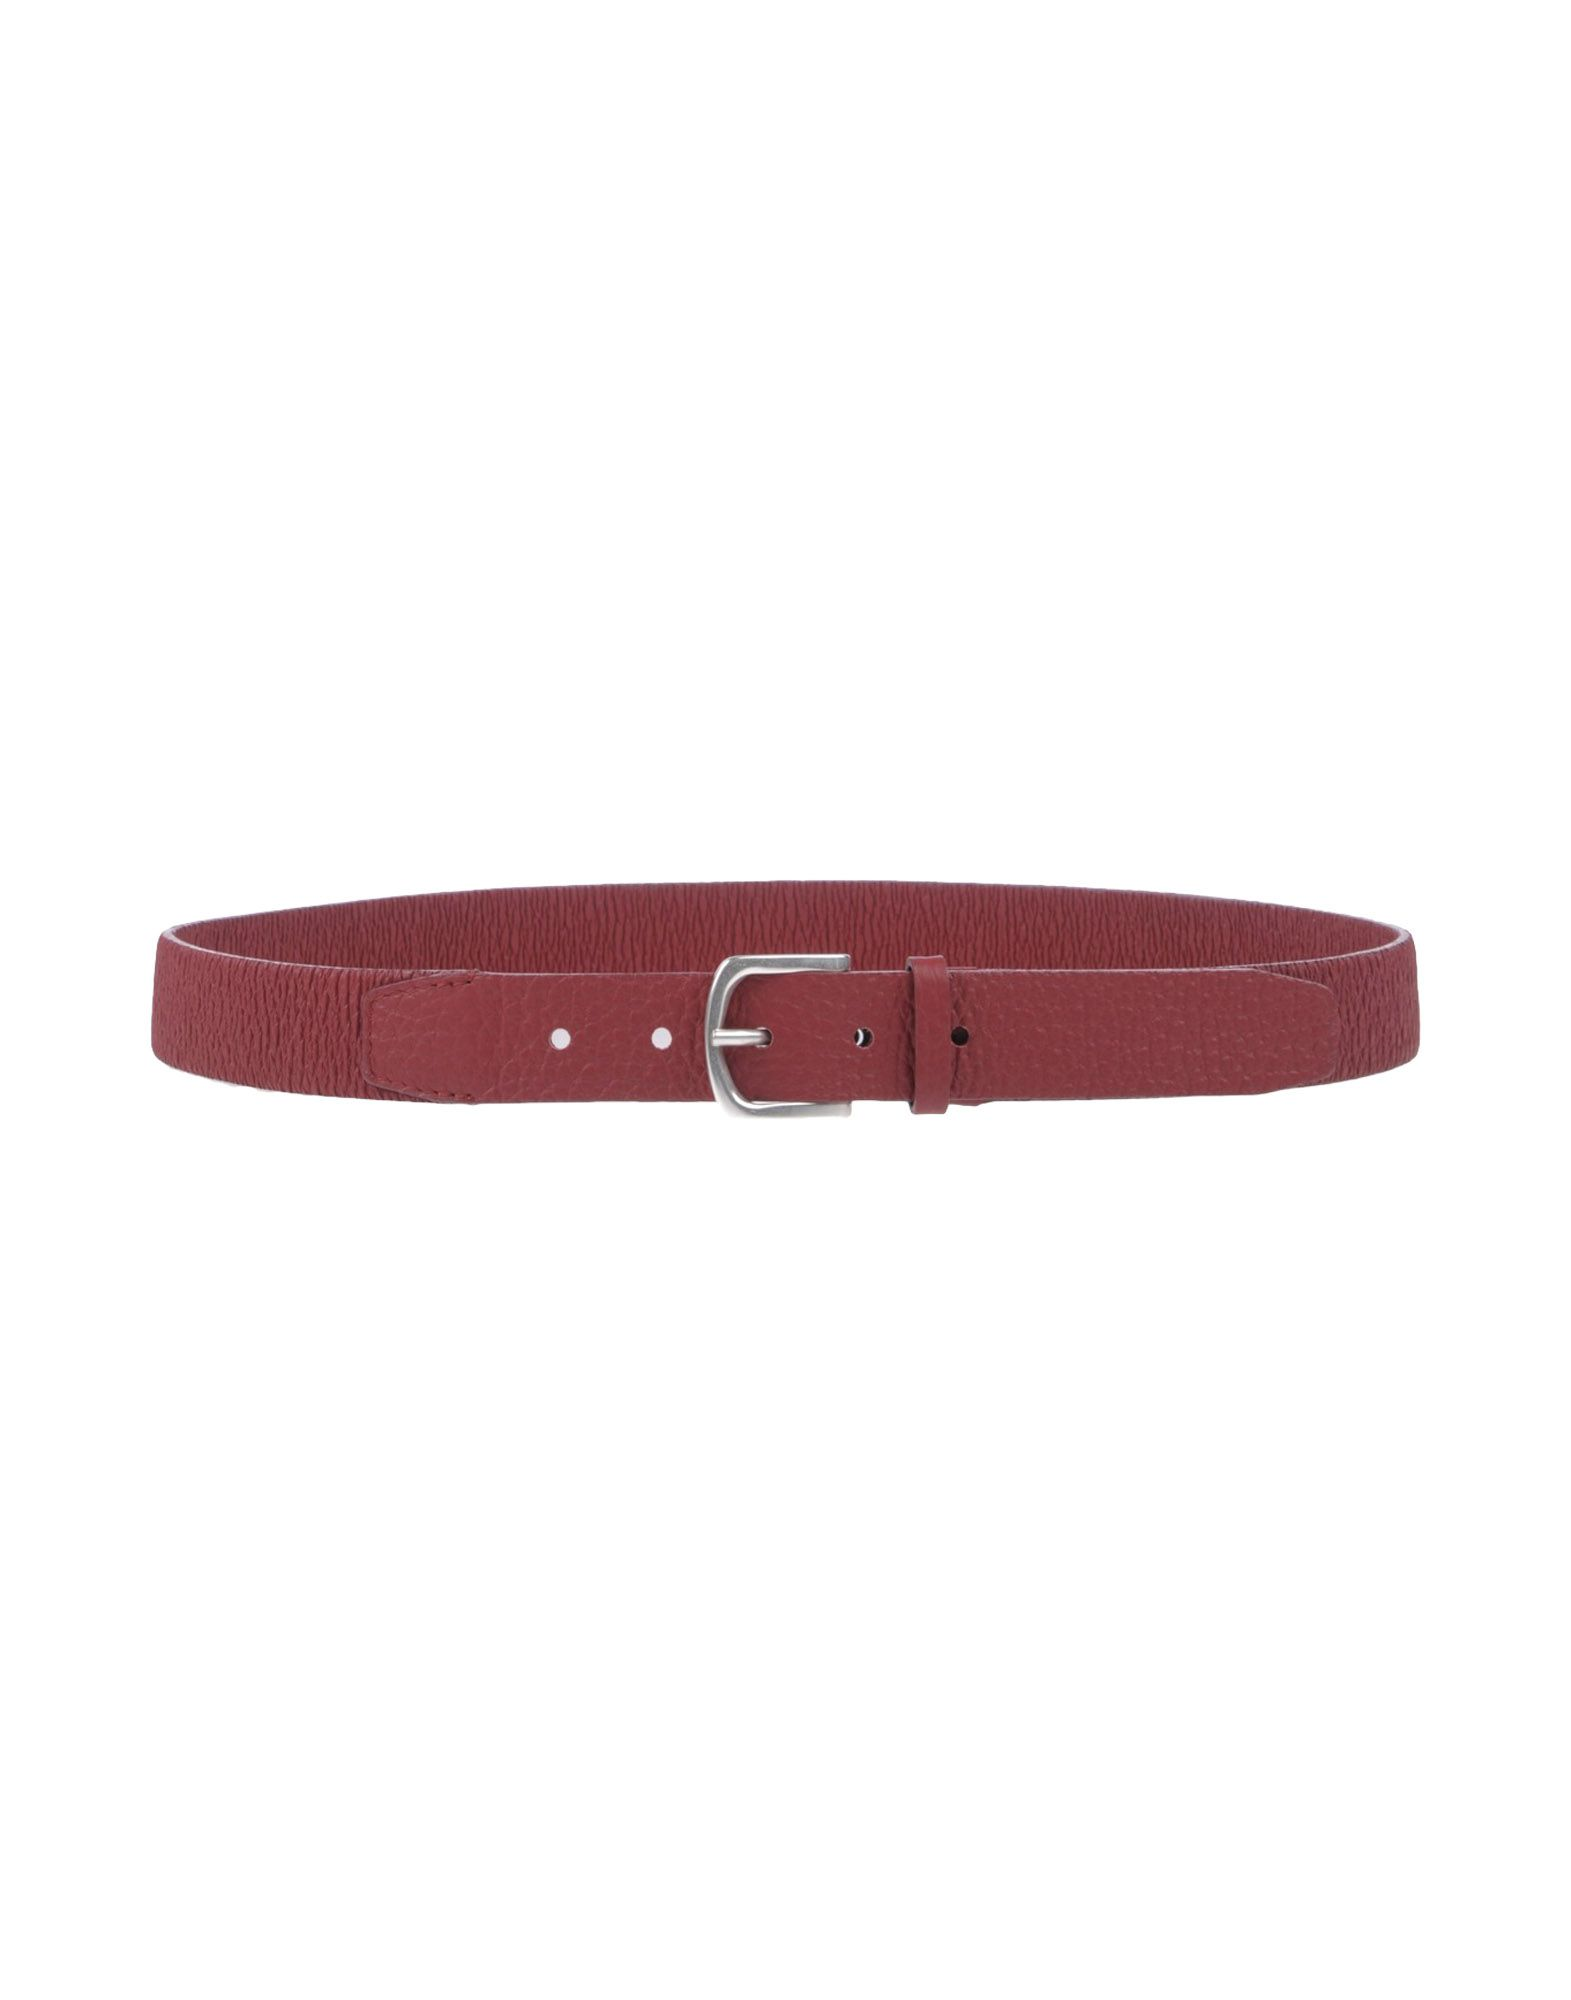 Small Leather Goods - Belts La Perla